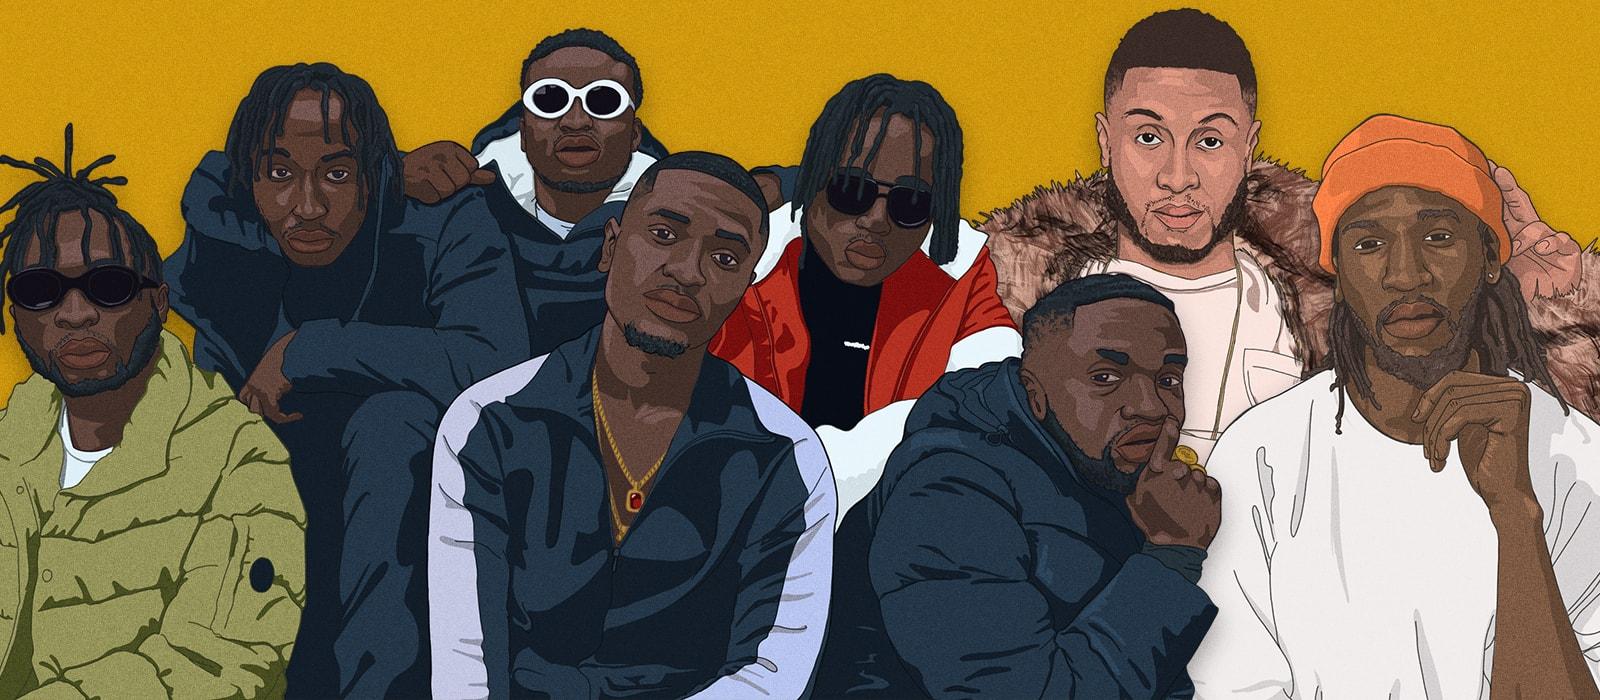 UK Music Acts Jay Prince NSG Jelani Blackman wonder EP OT Bop Lockjaw Jay Electronica Jess Glynne Soulection Hip-Hop R&B Afrobeats Afroswing